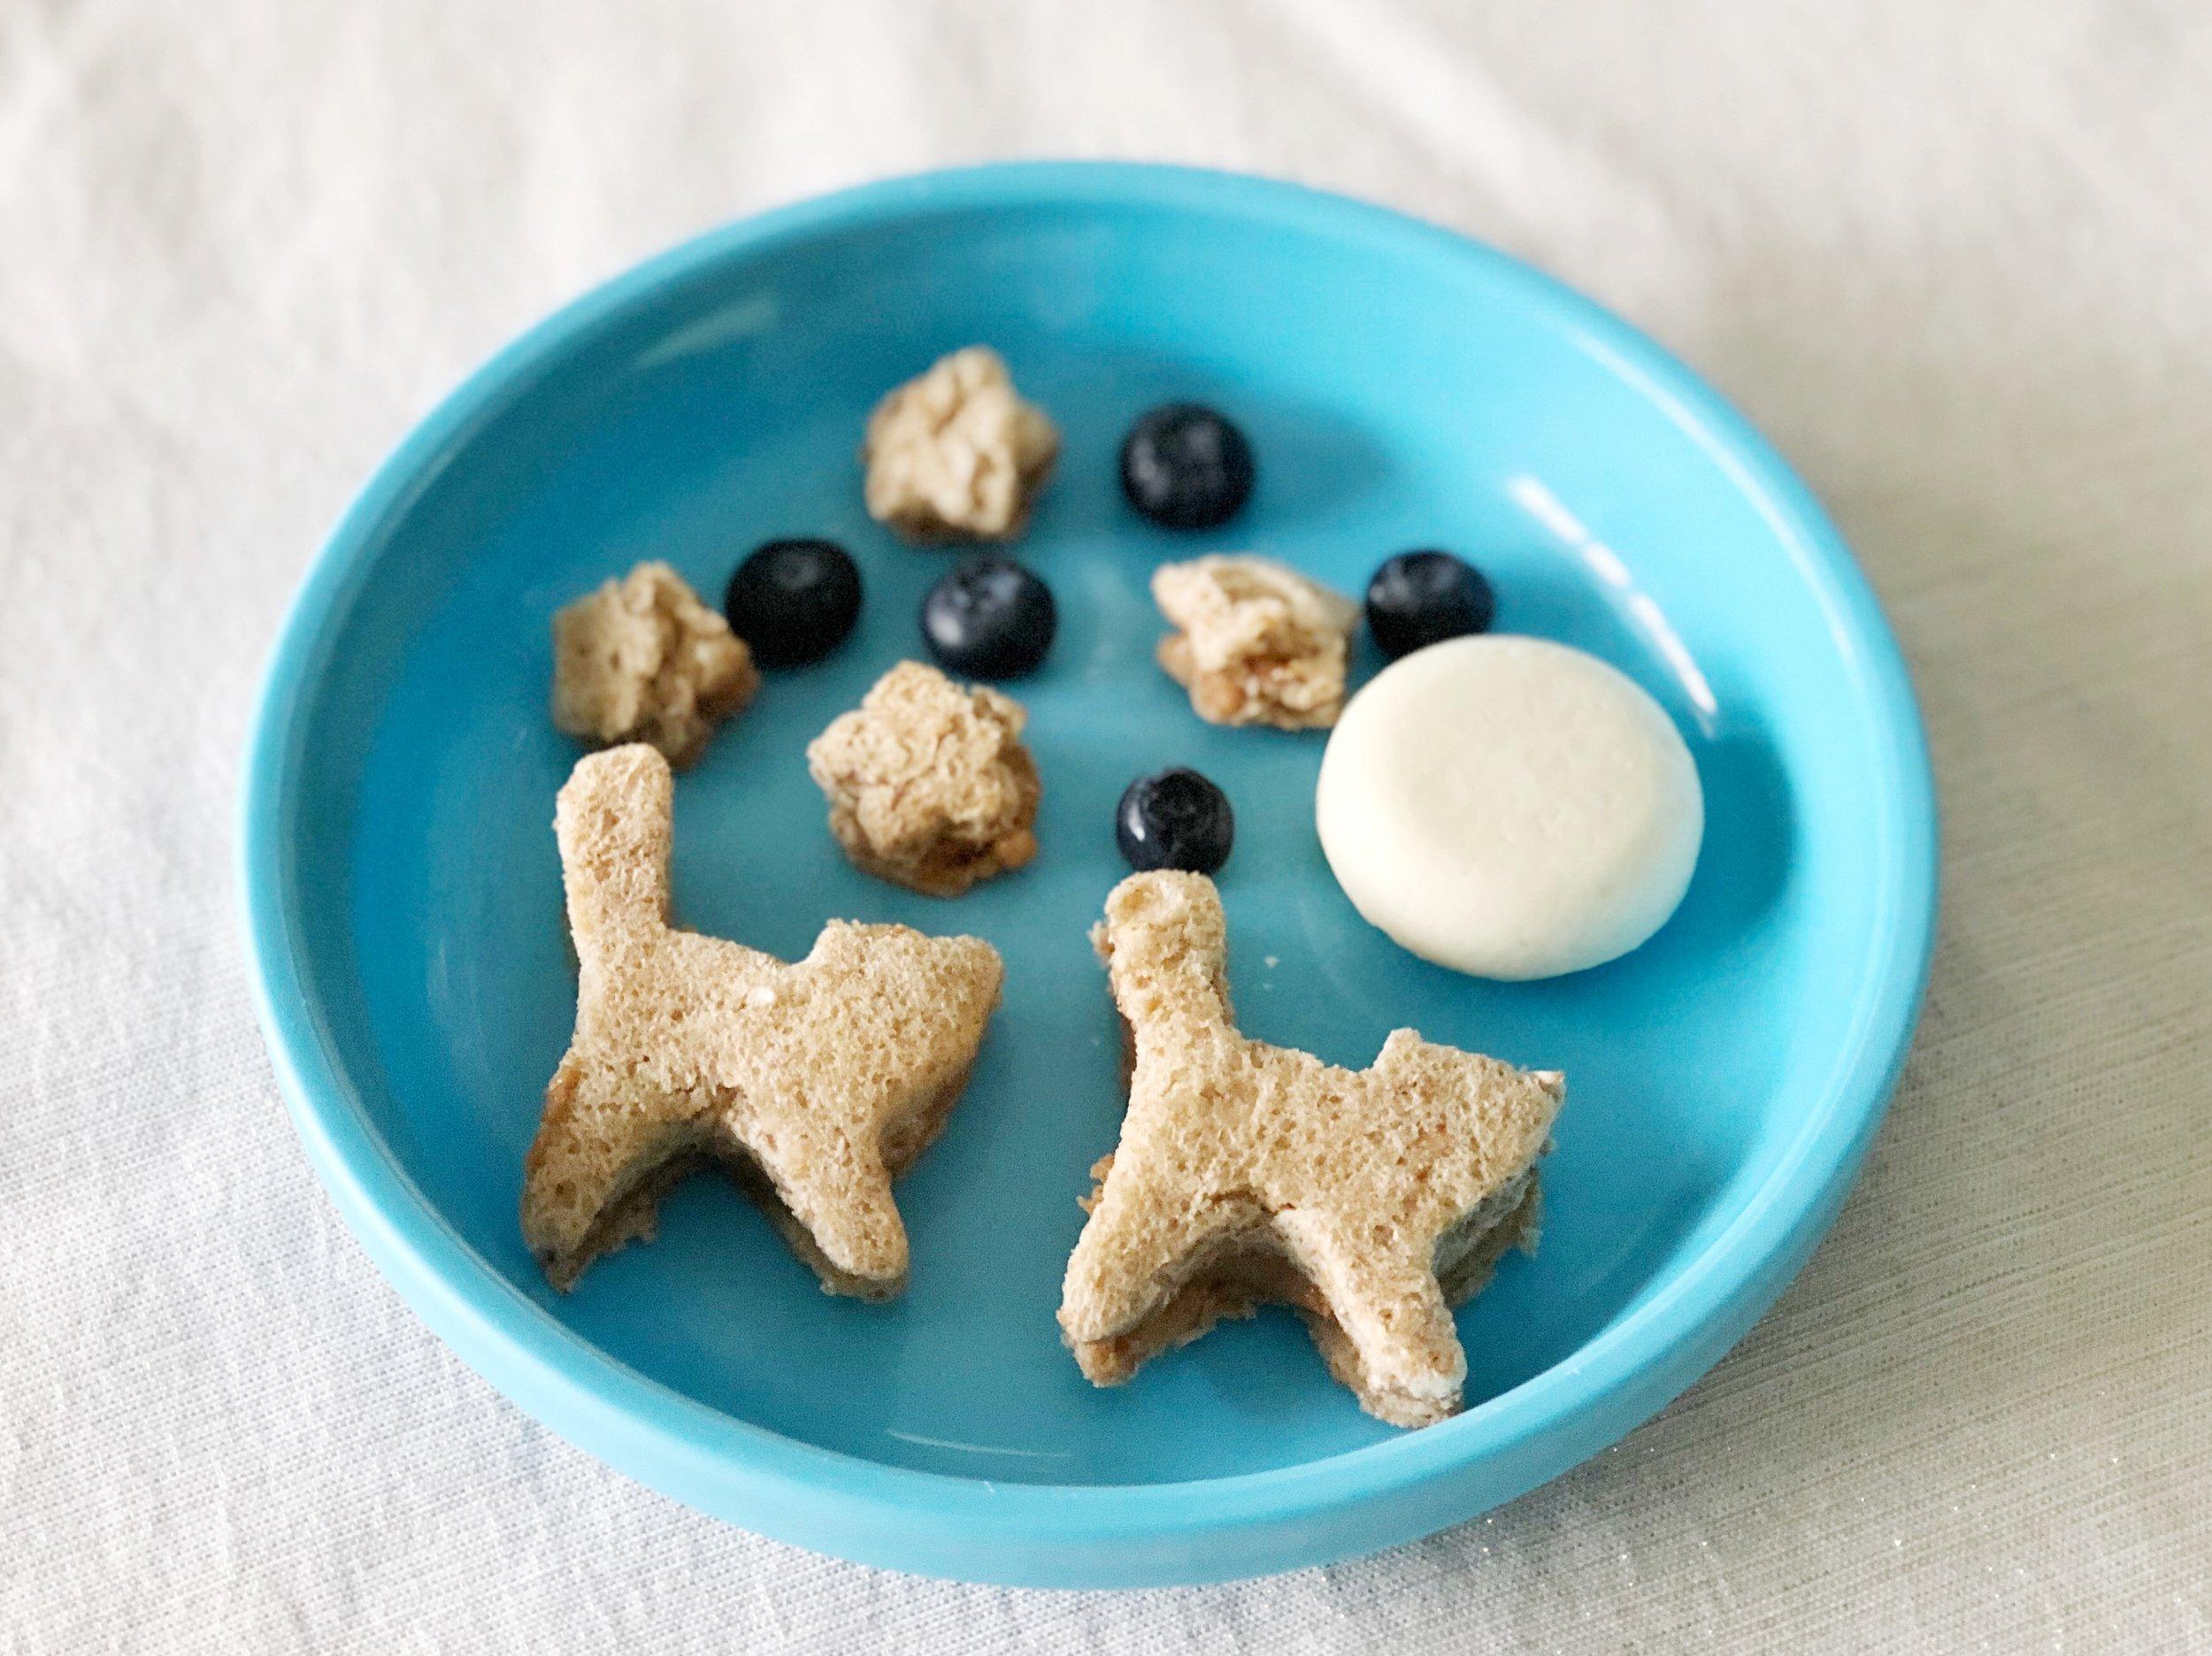 toddler-lunch-cat-sandwich-ikea-plate